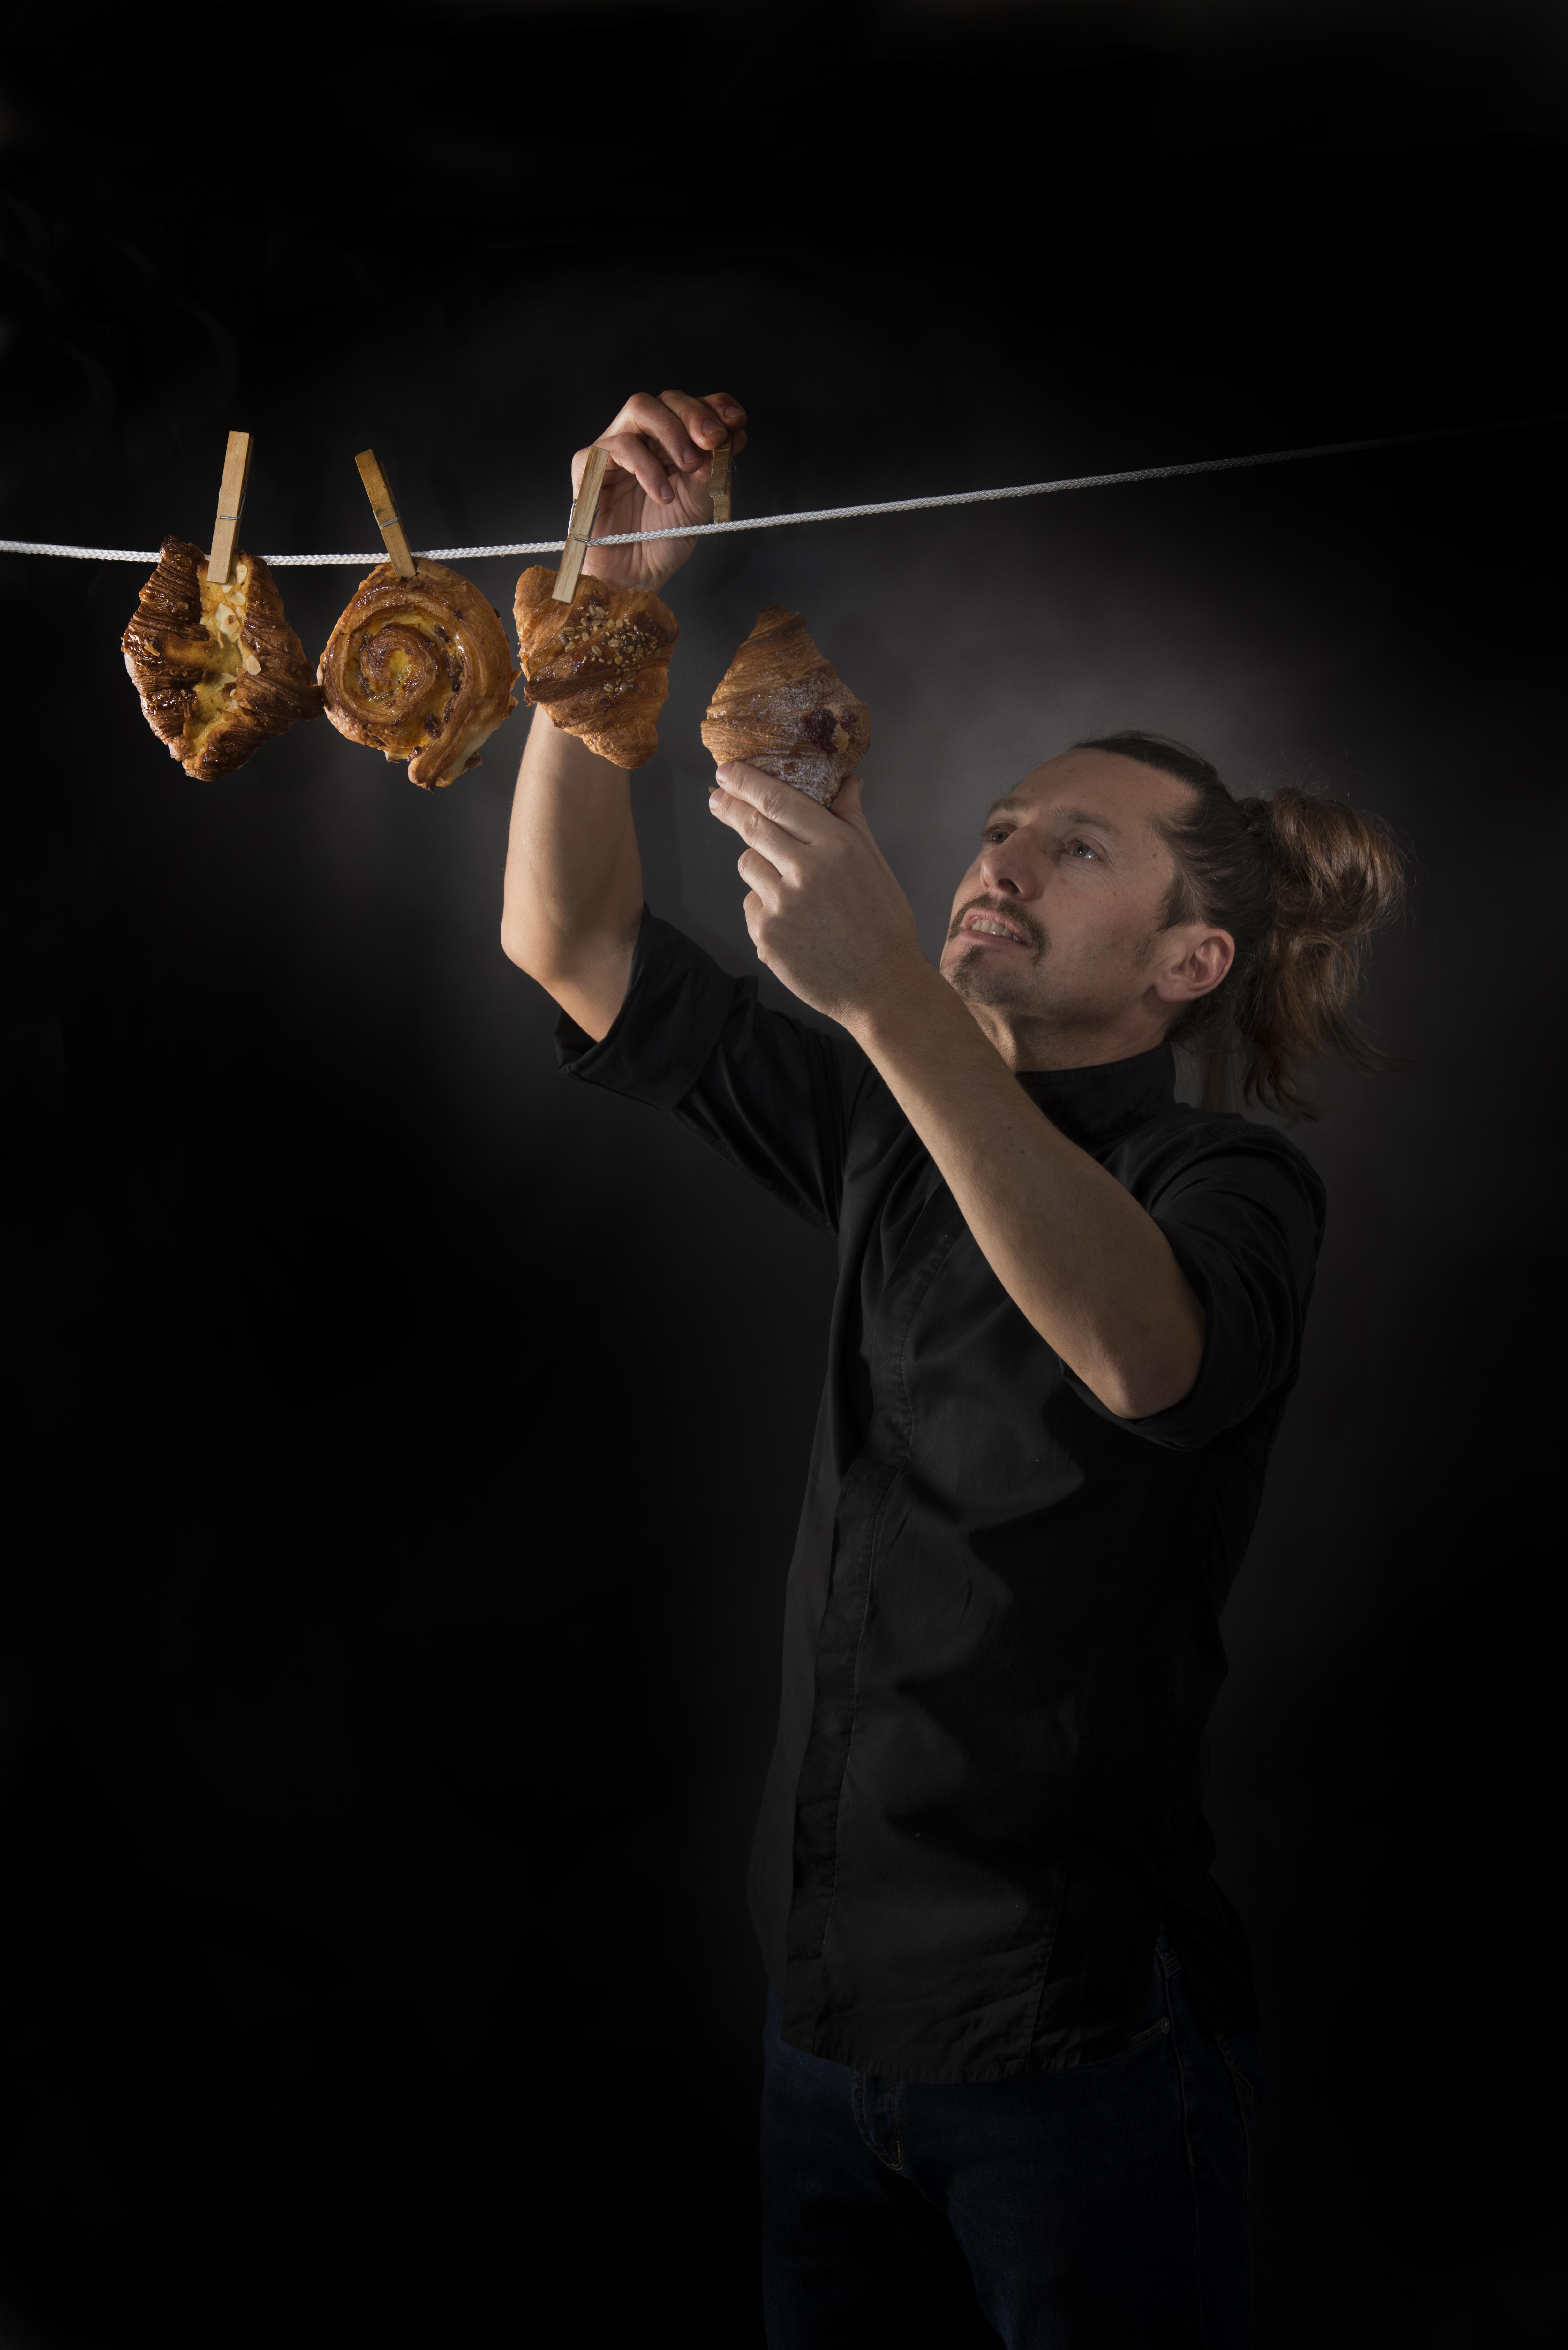 Michel Paquier stende i croissant